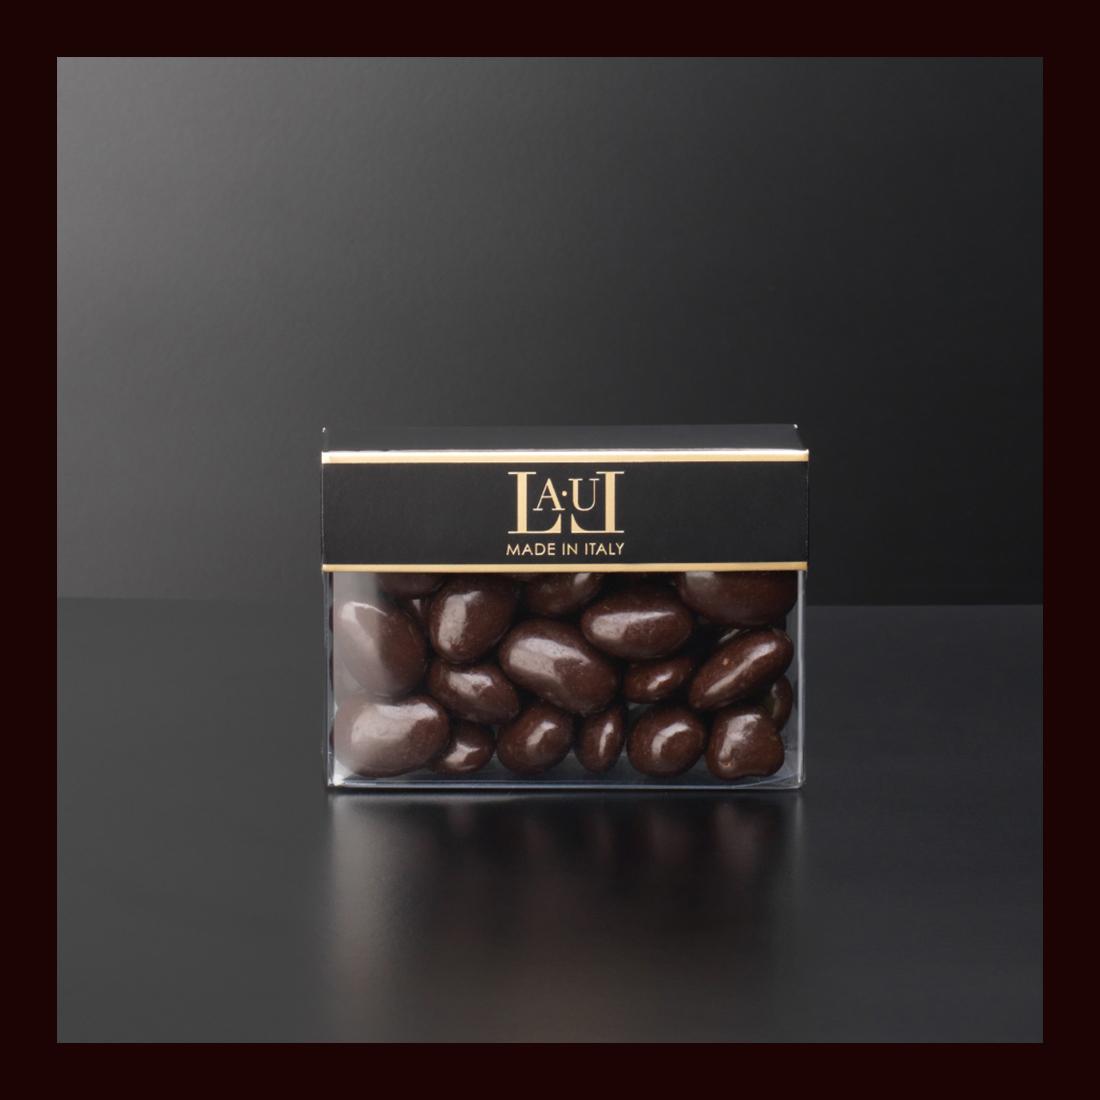 Dragées di cioccolato extra fondente con mandorla intera